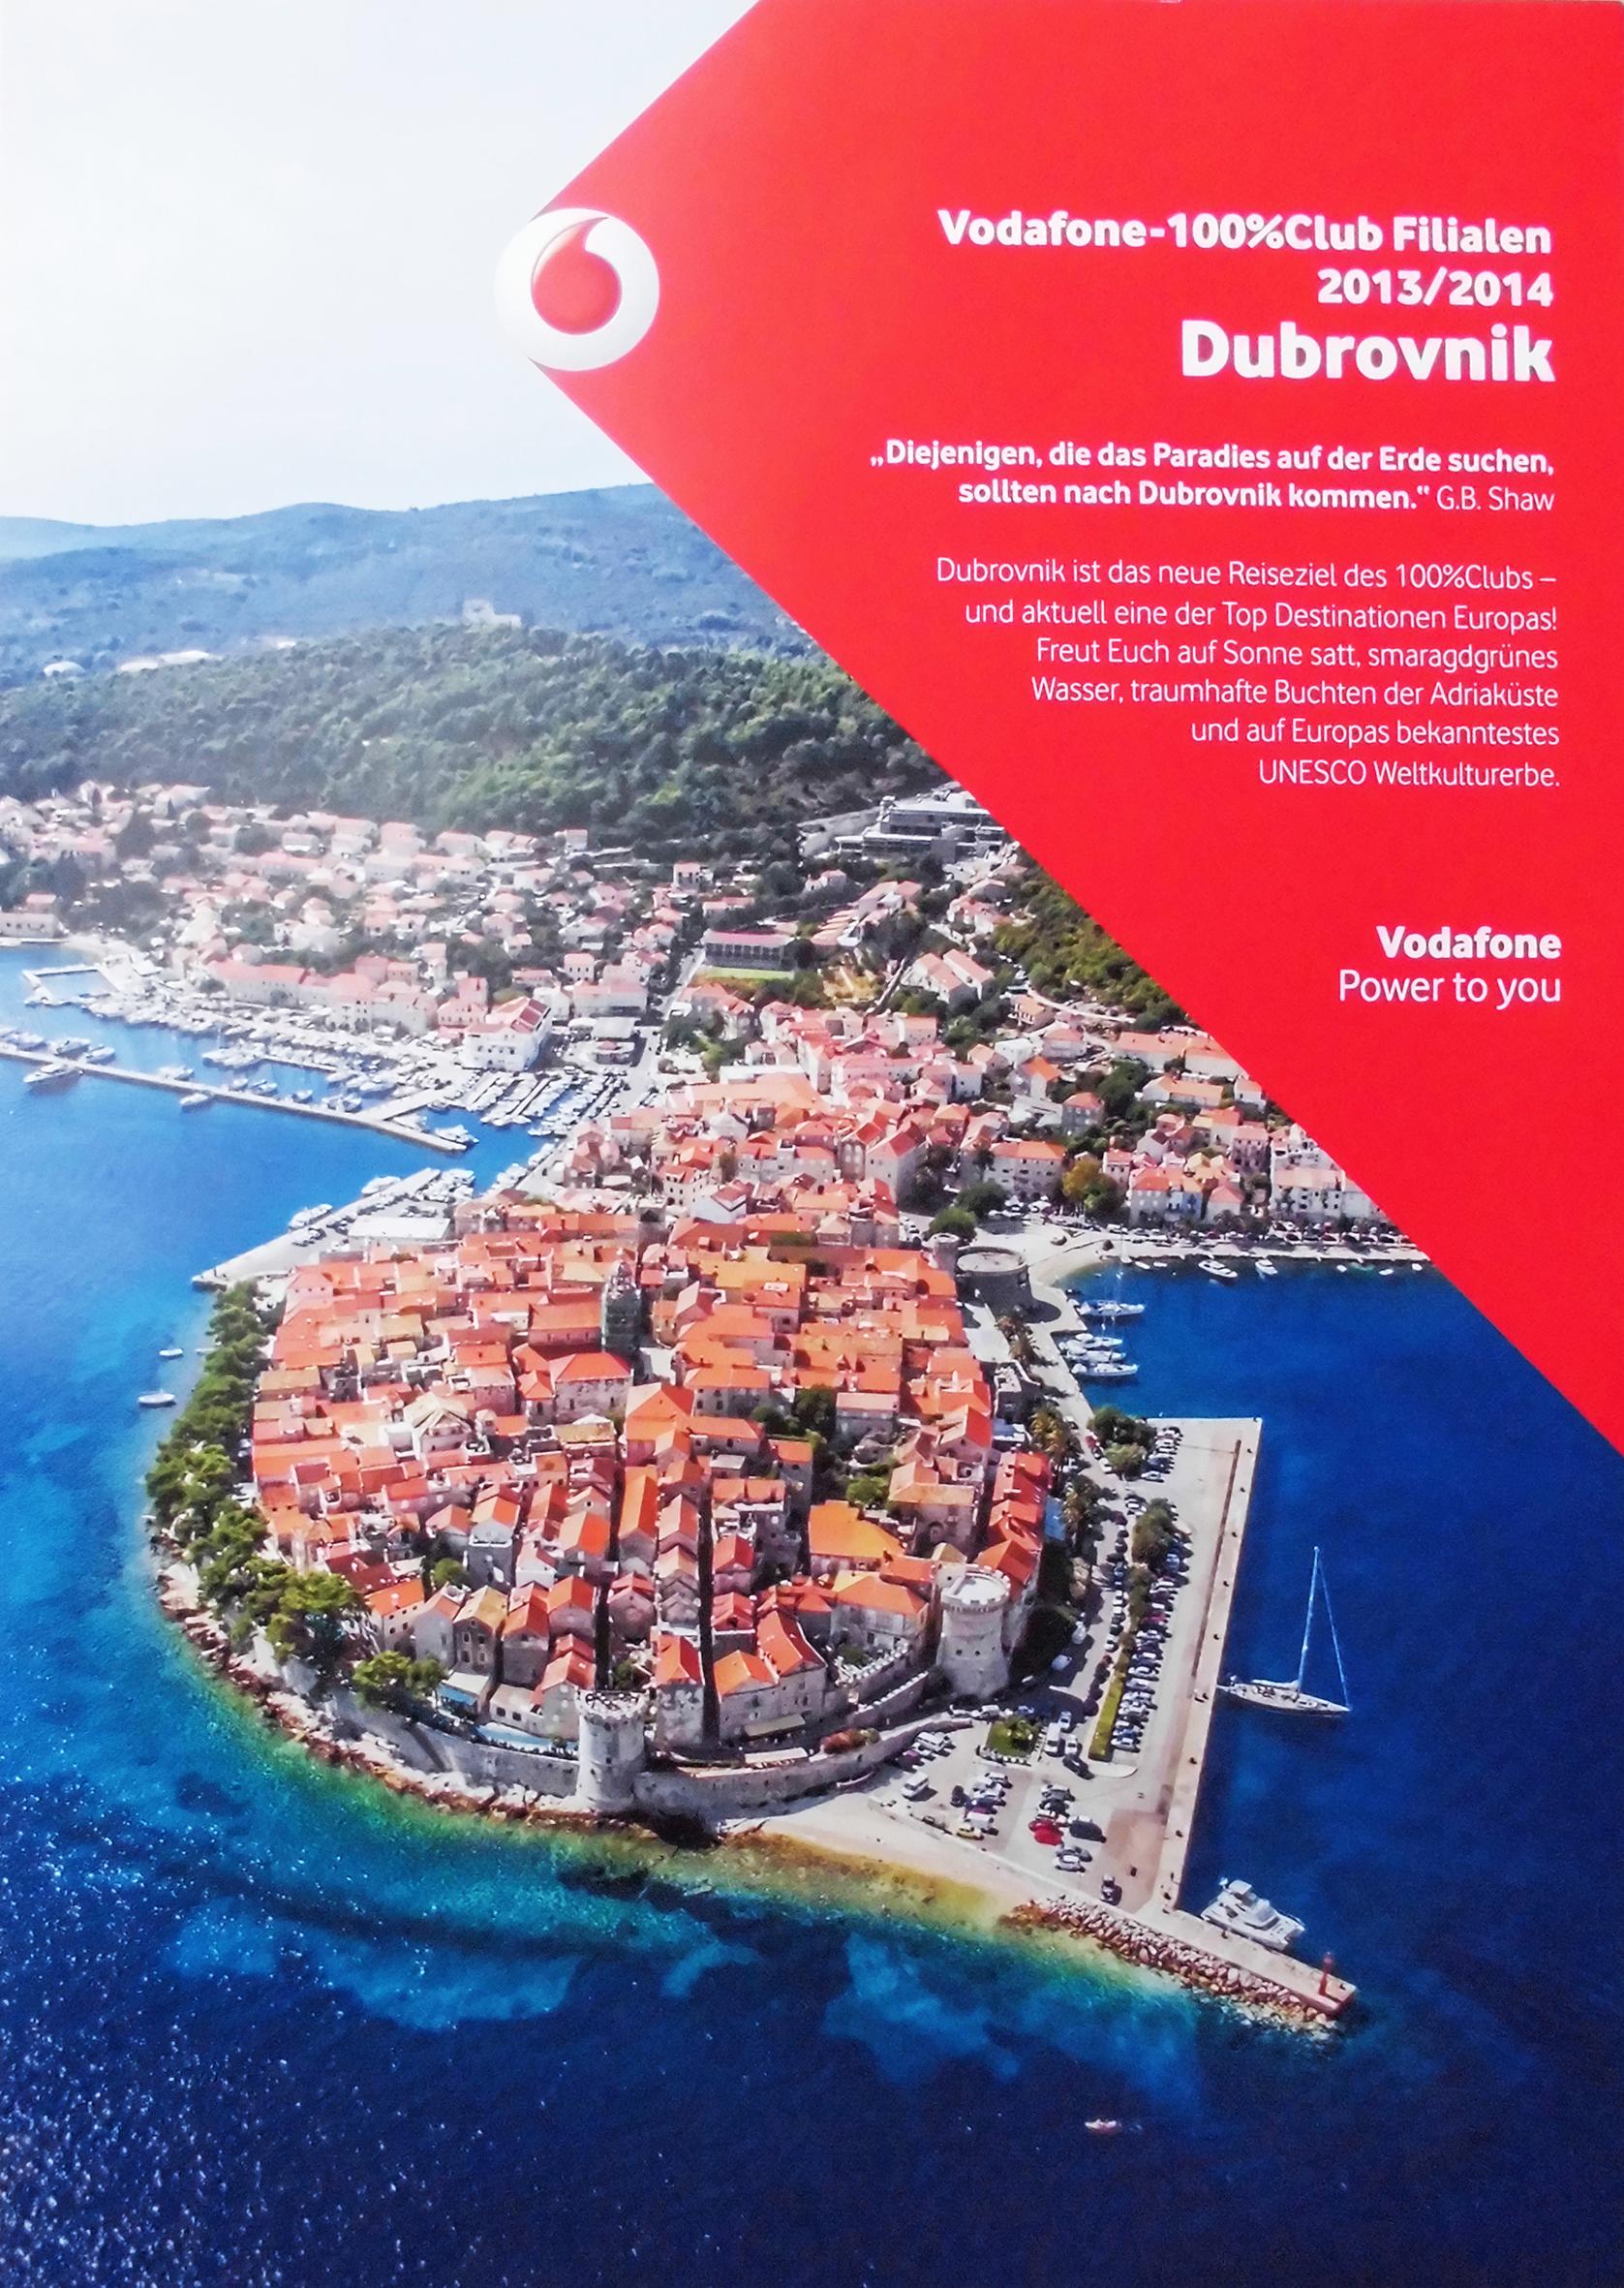 Vodafone_Flyer.jpg